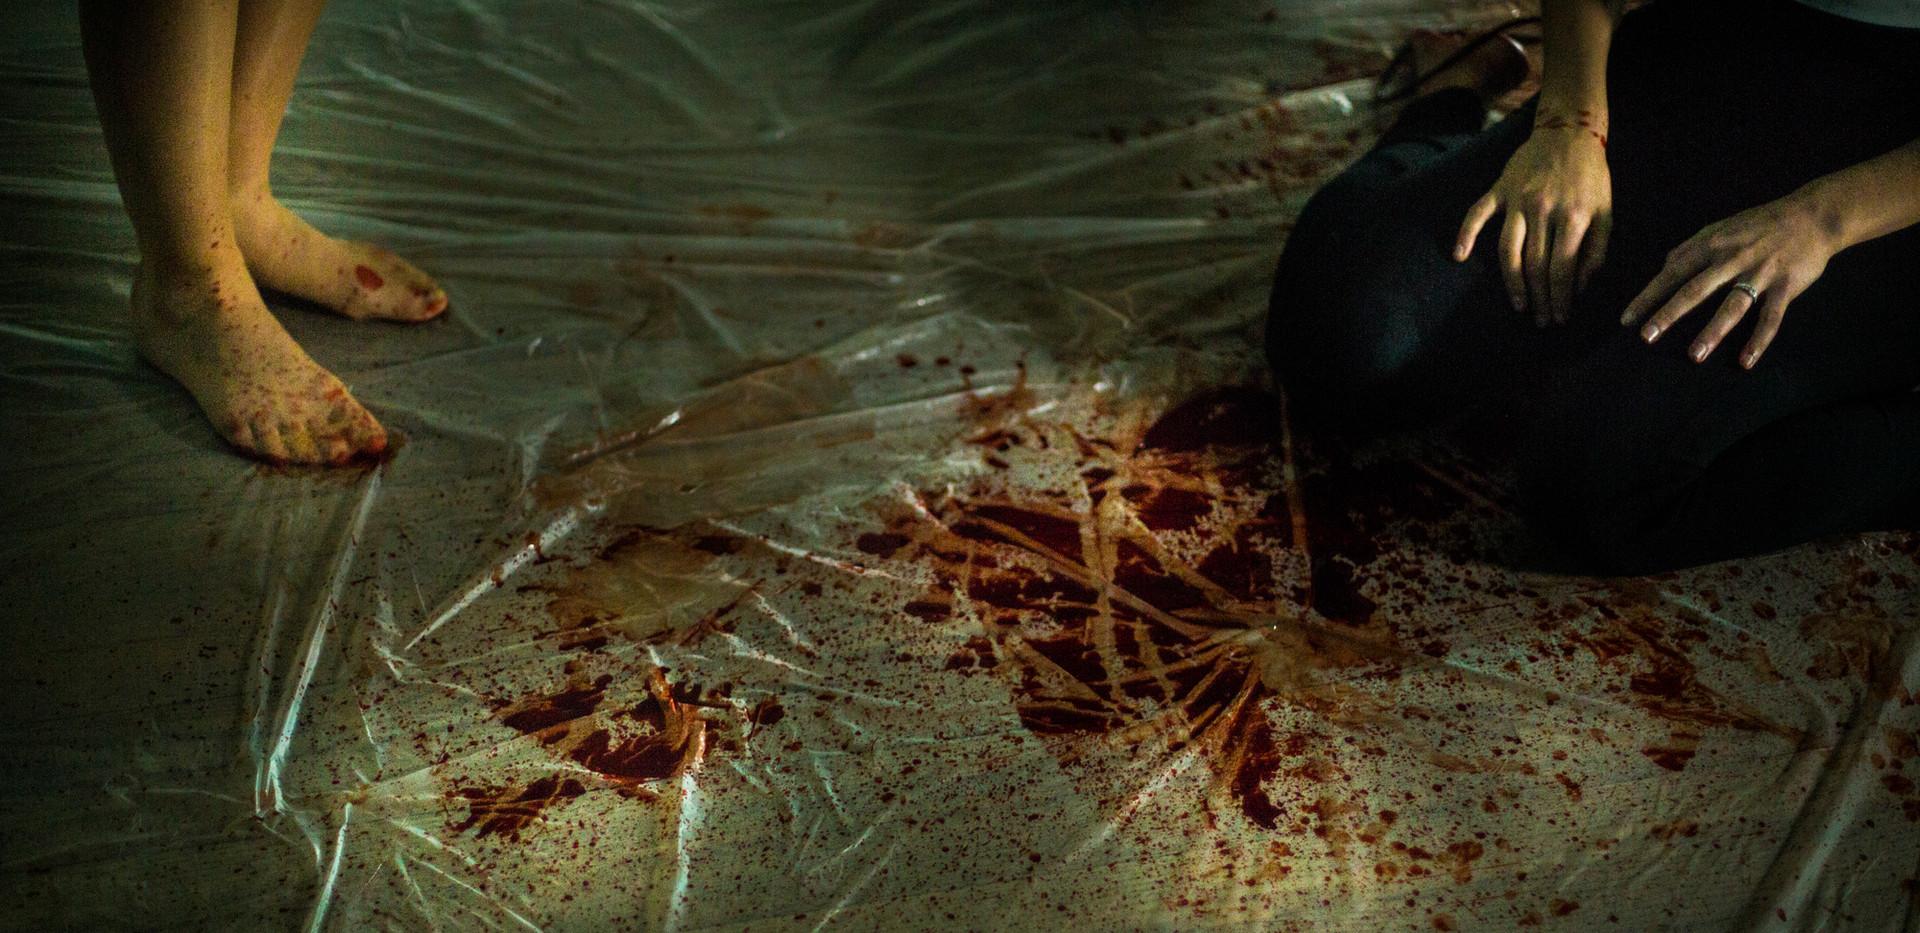 Blood on the floor.jpg